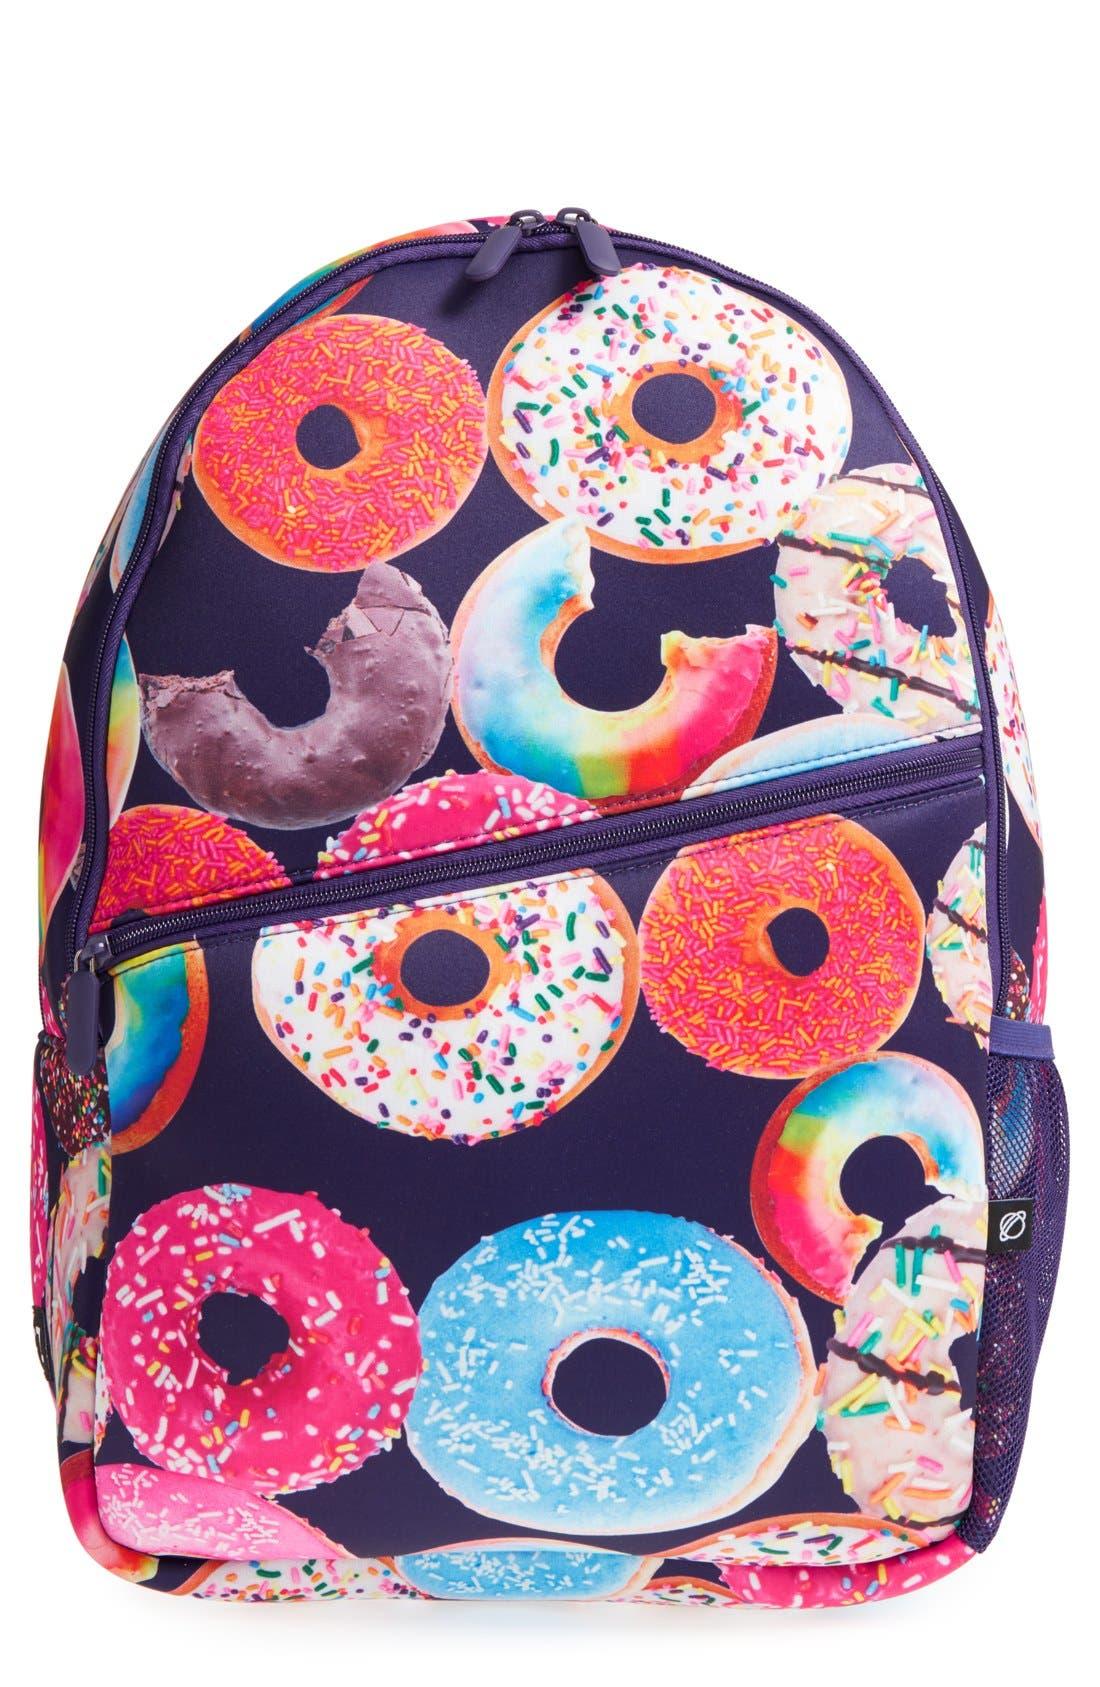 'Donut Shop' Neoprene Backpack,                         Main,                         color, Black Multi